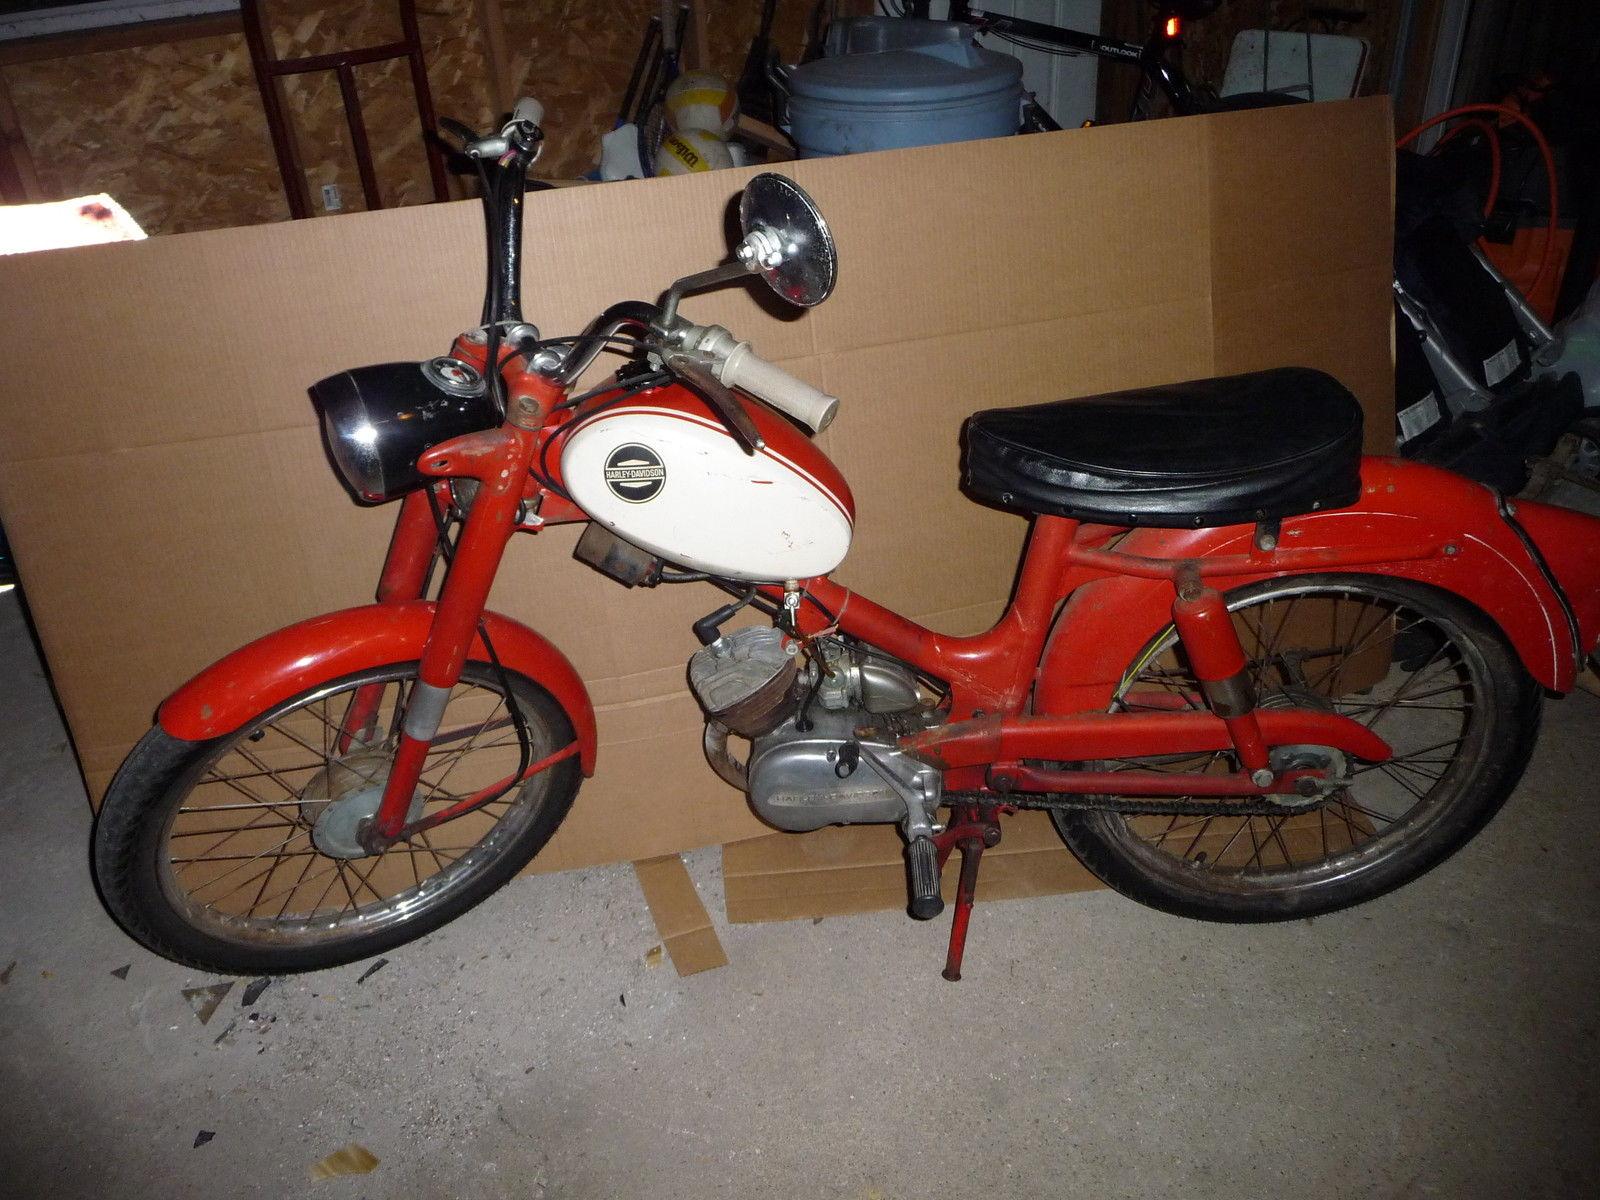 1965 Aermacchi Harley Davidson M50 Scooter 50CC Vintage Motorcycle